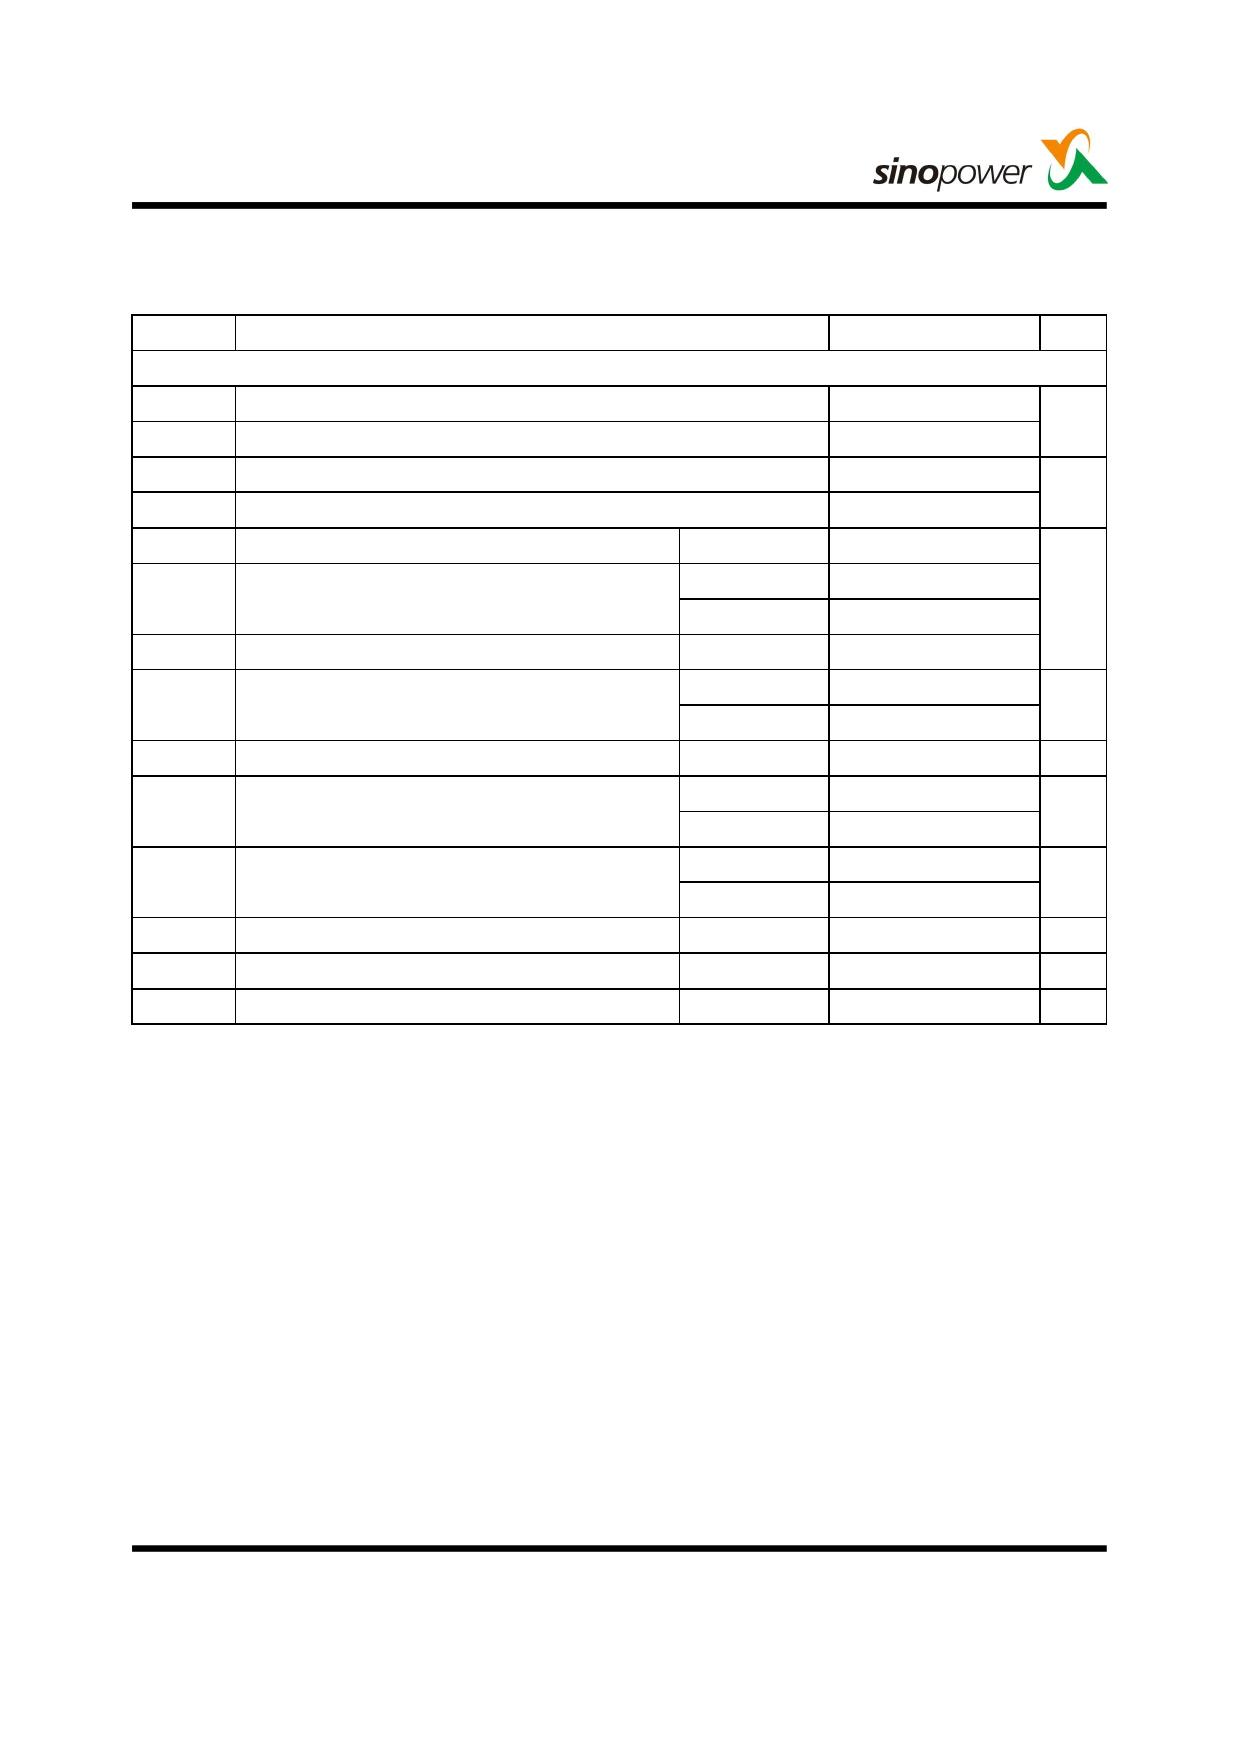 SM7509NSF pdf, equivalent, schematic